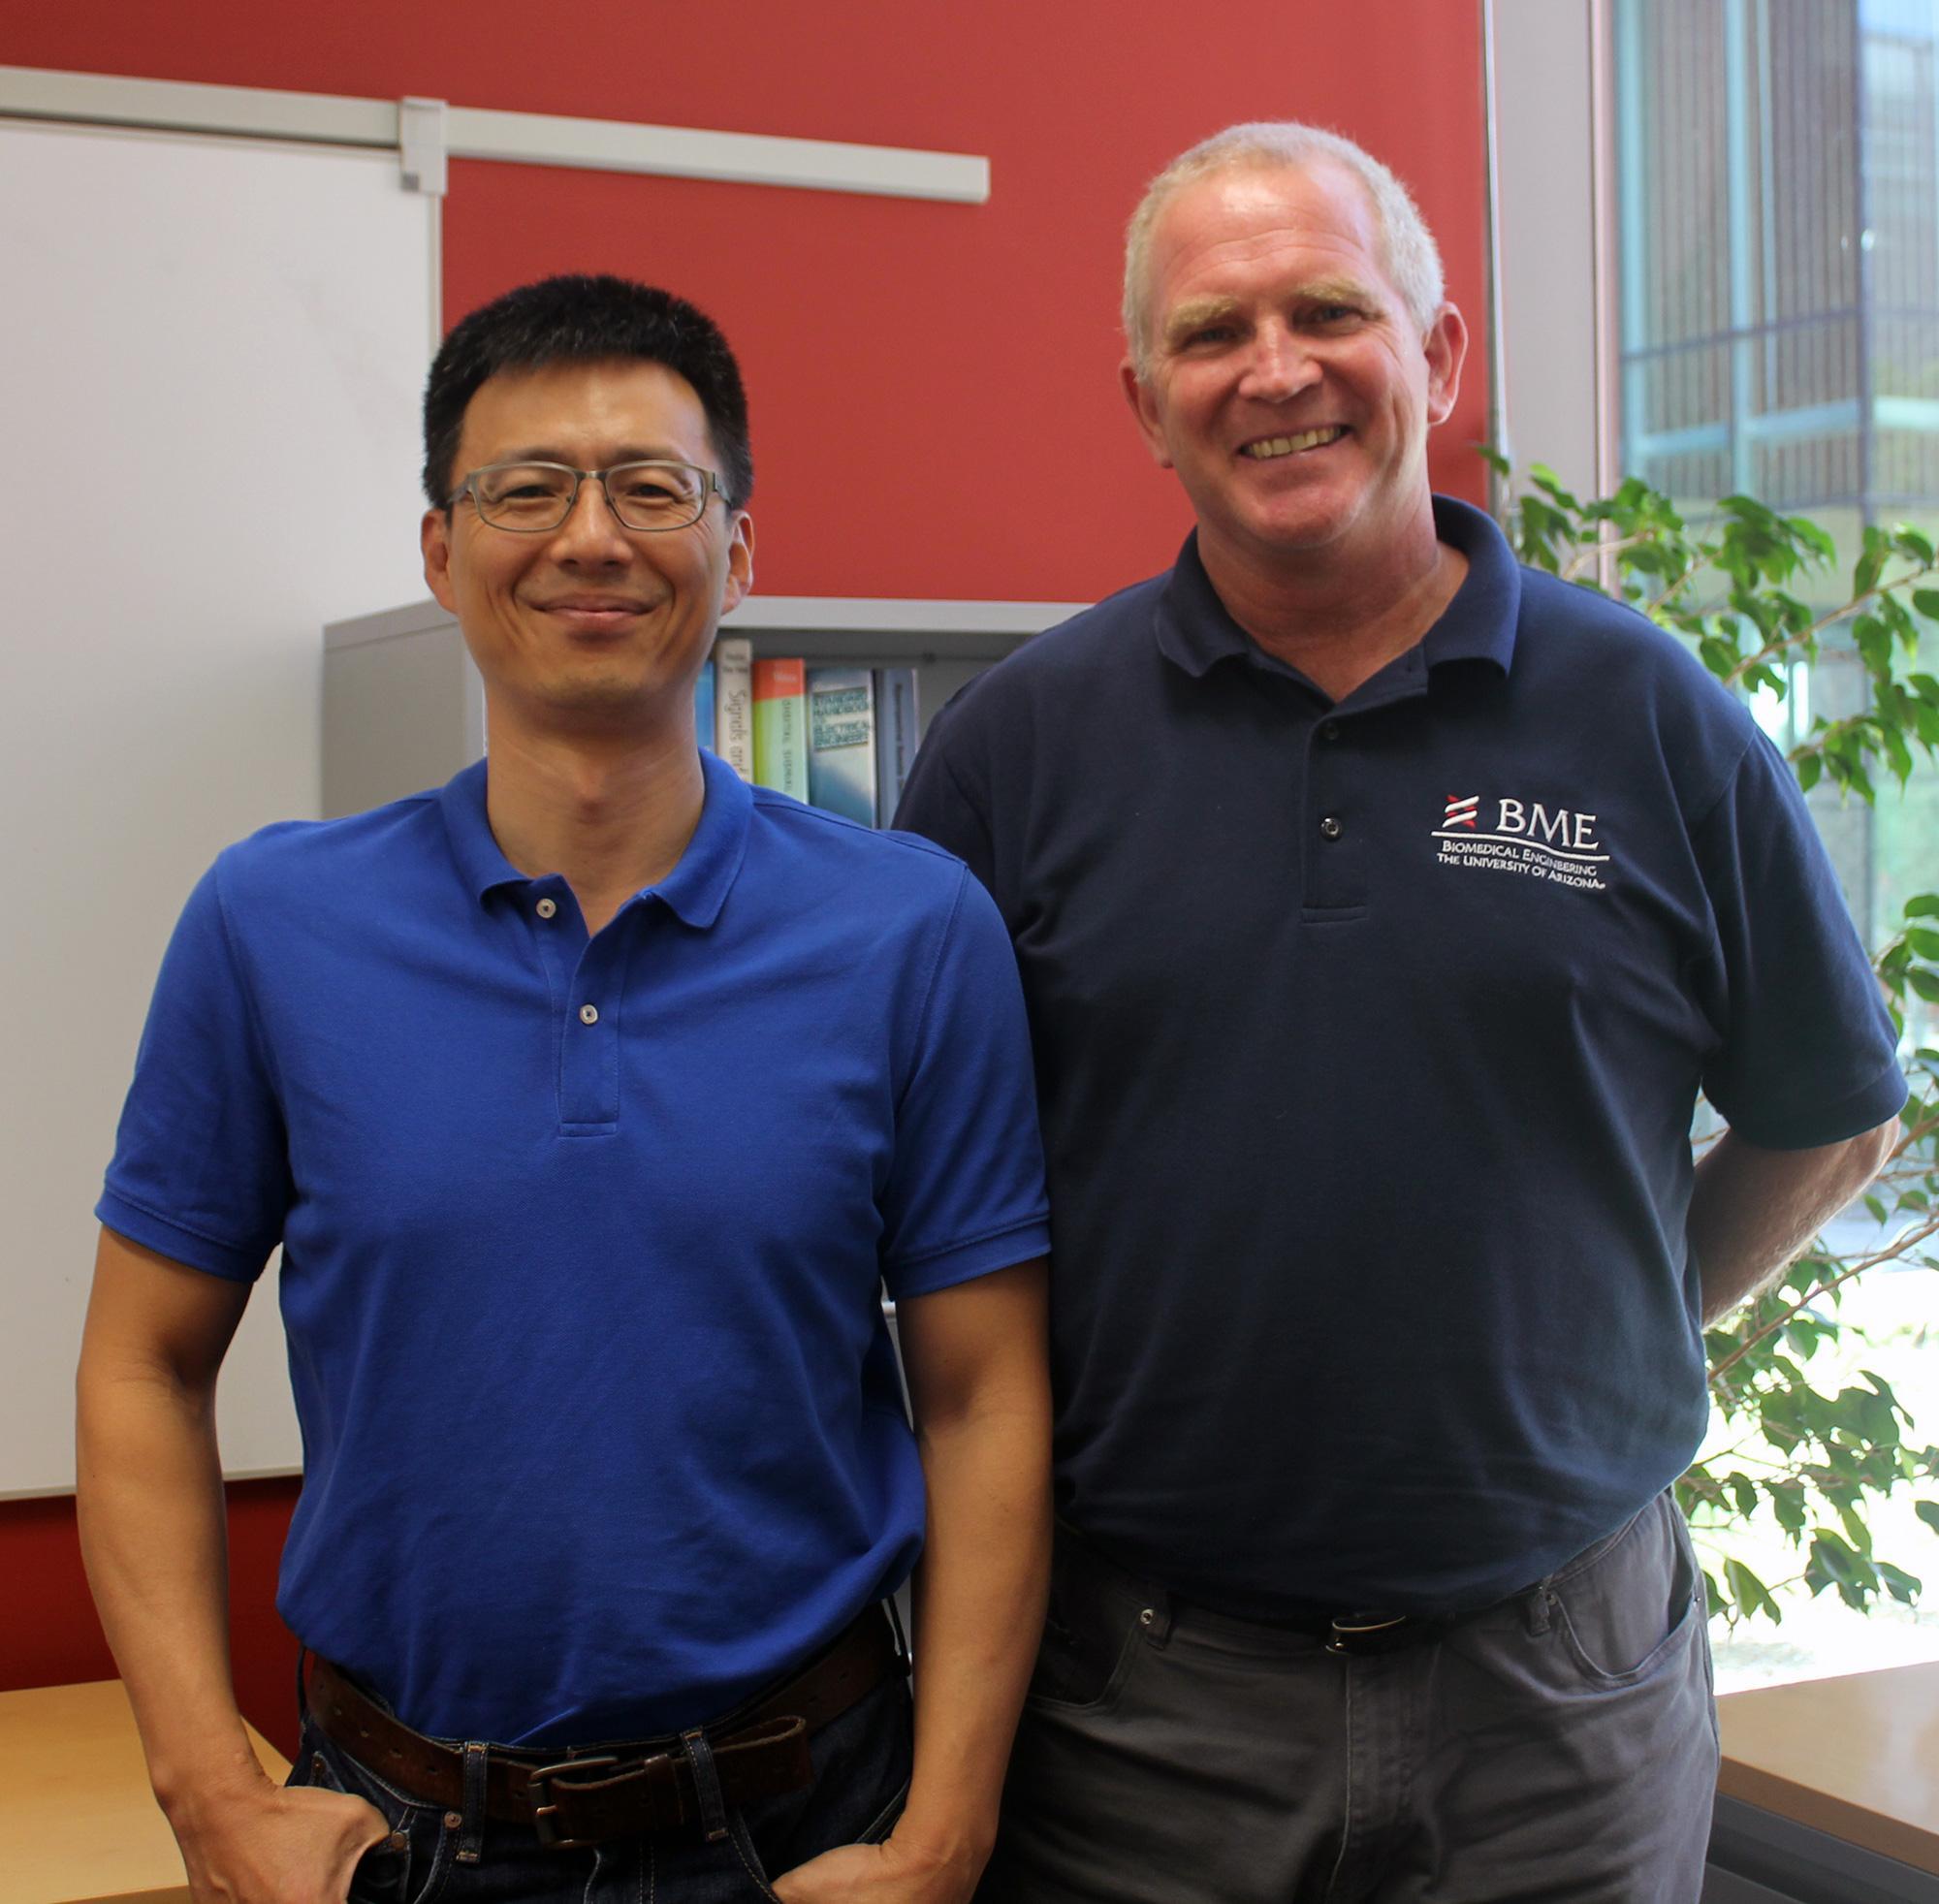 Nan-kuei Chen and Ted Trouard